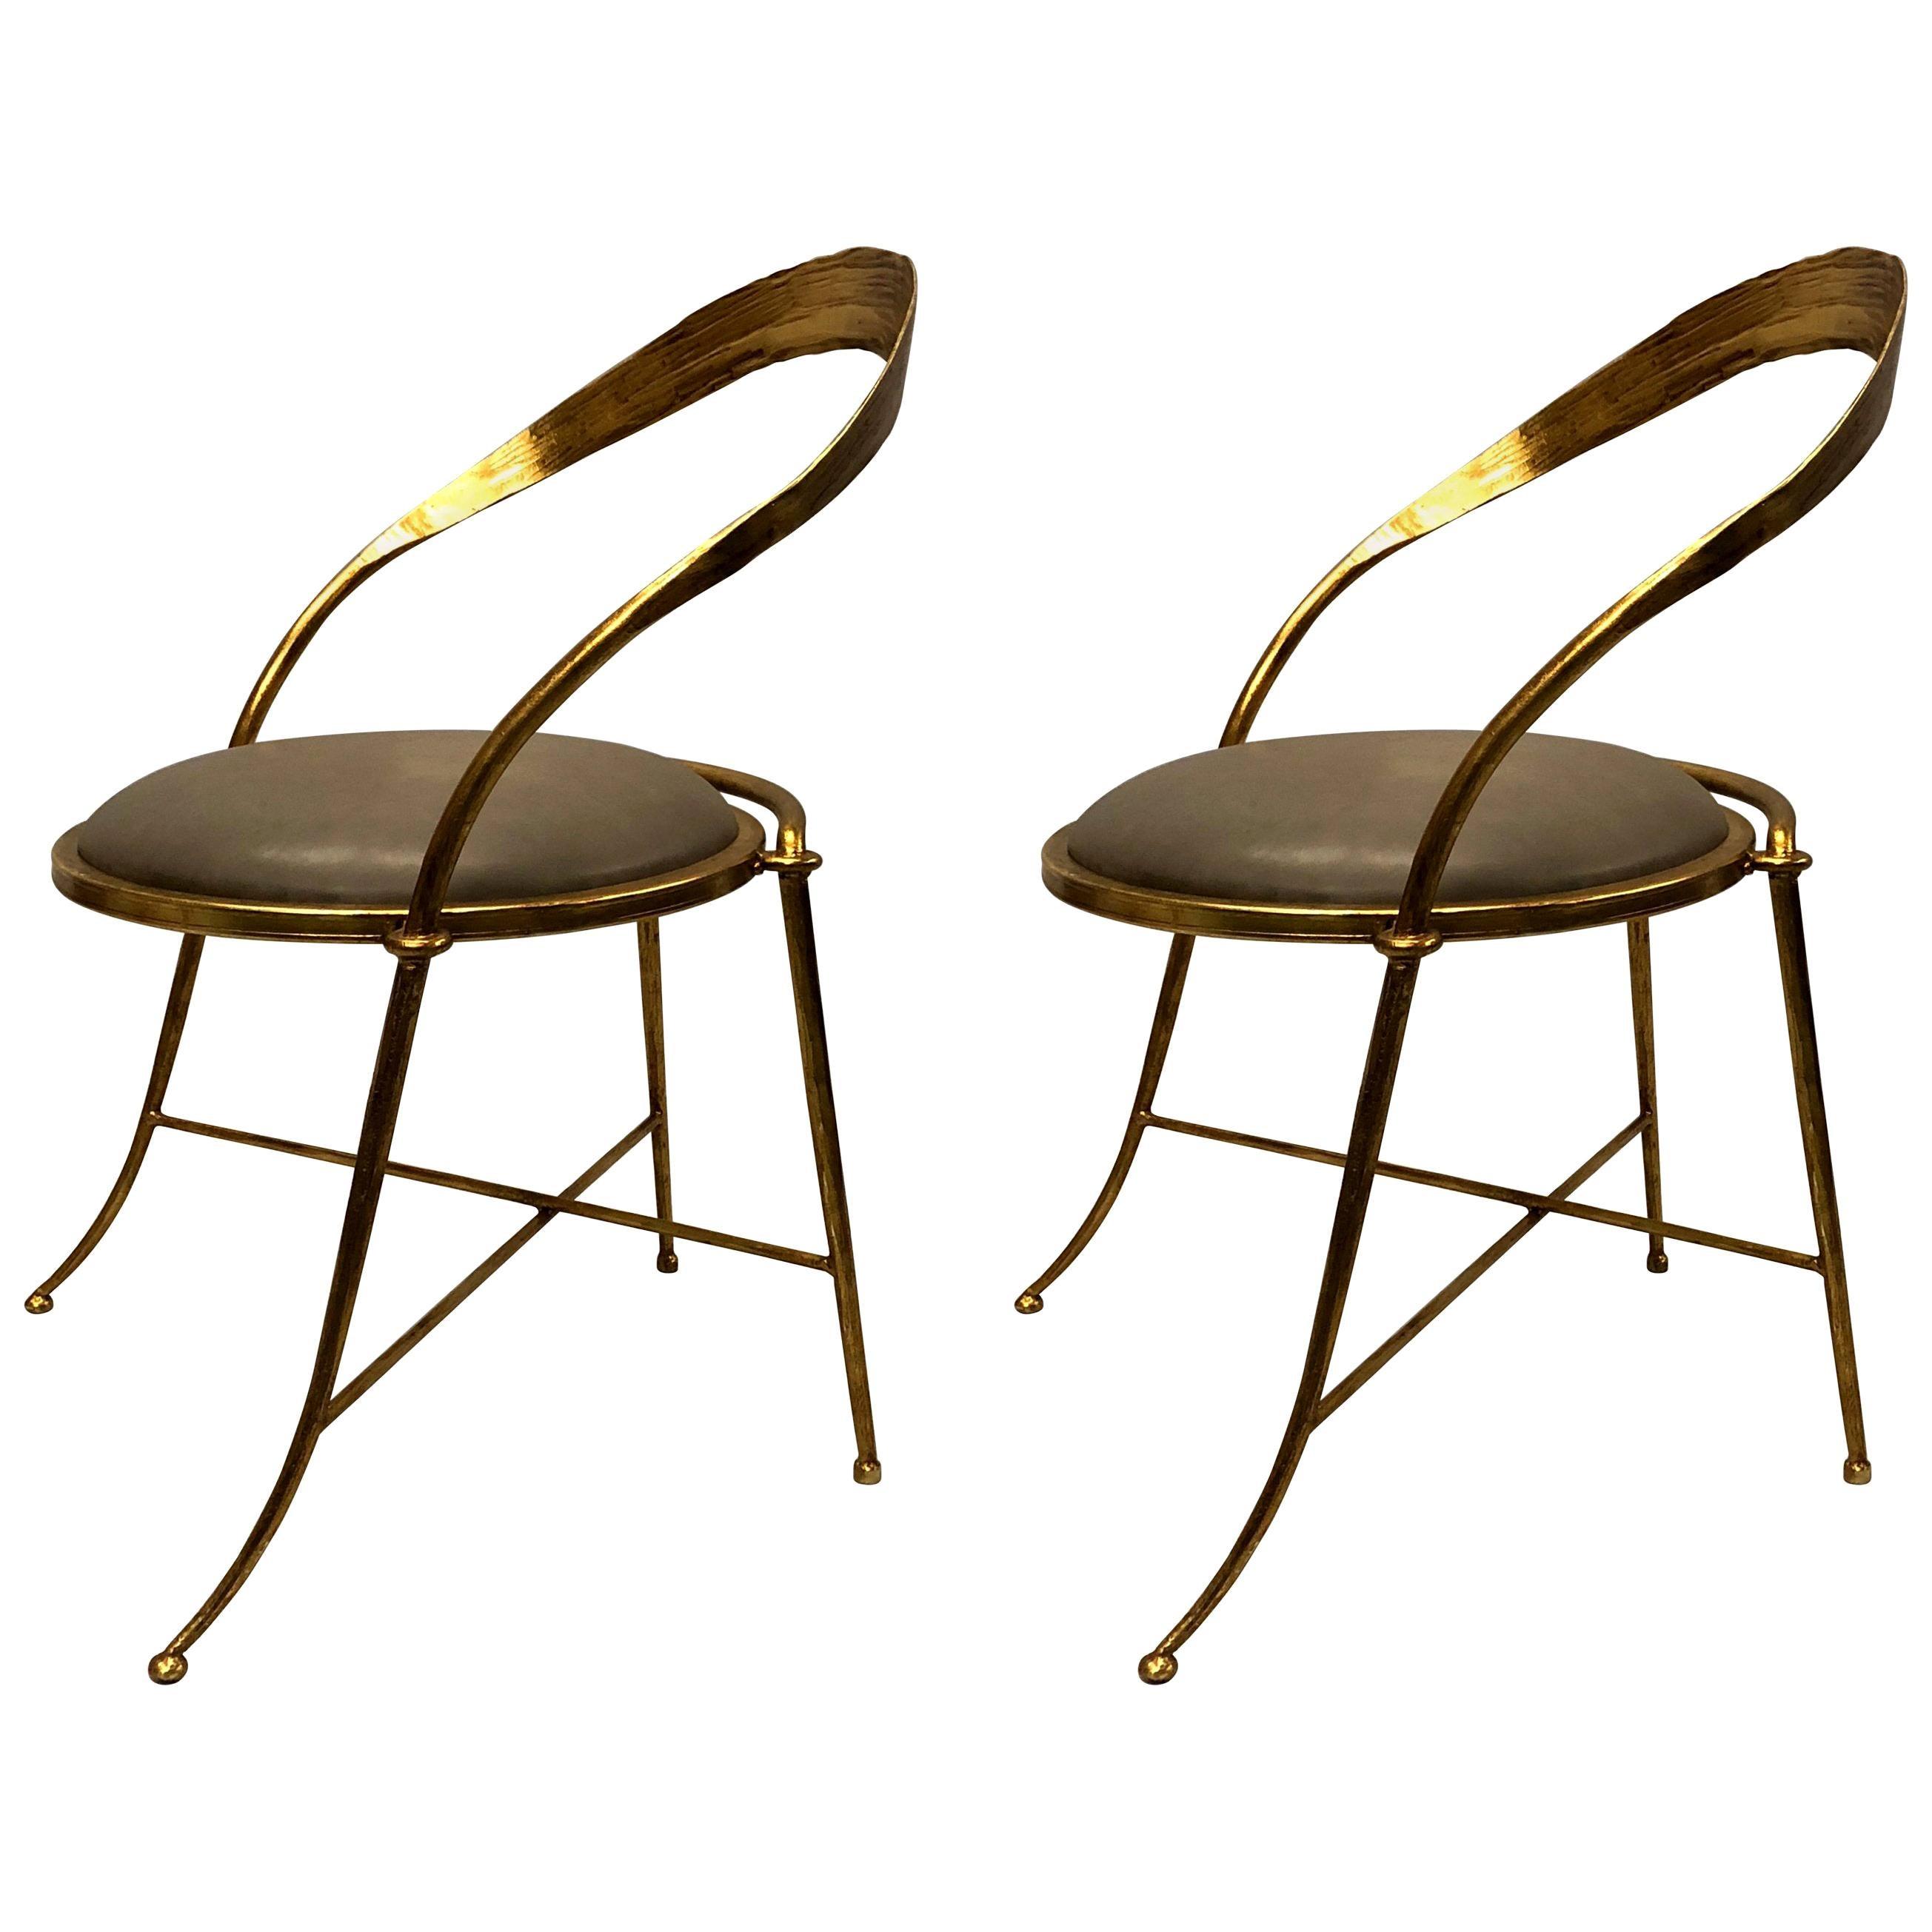 Pair of Italian Midcentury Handmade Gilt Iron Lounge Chairs by Giovanni Banci